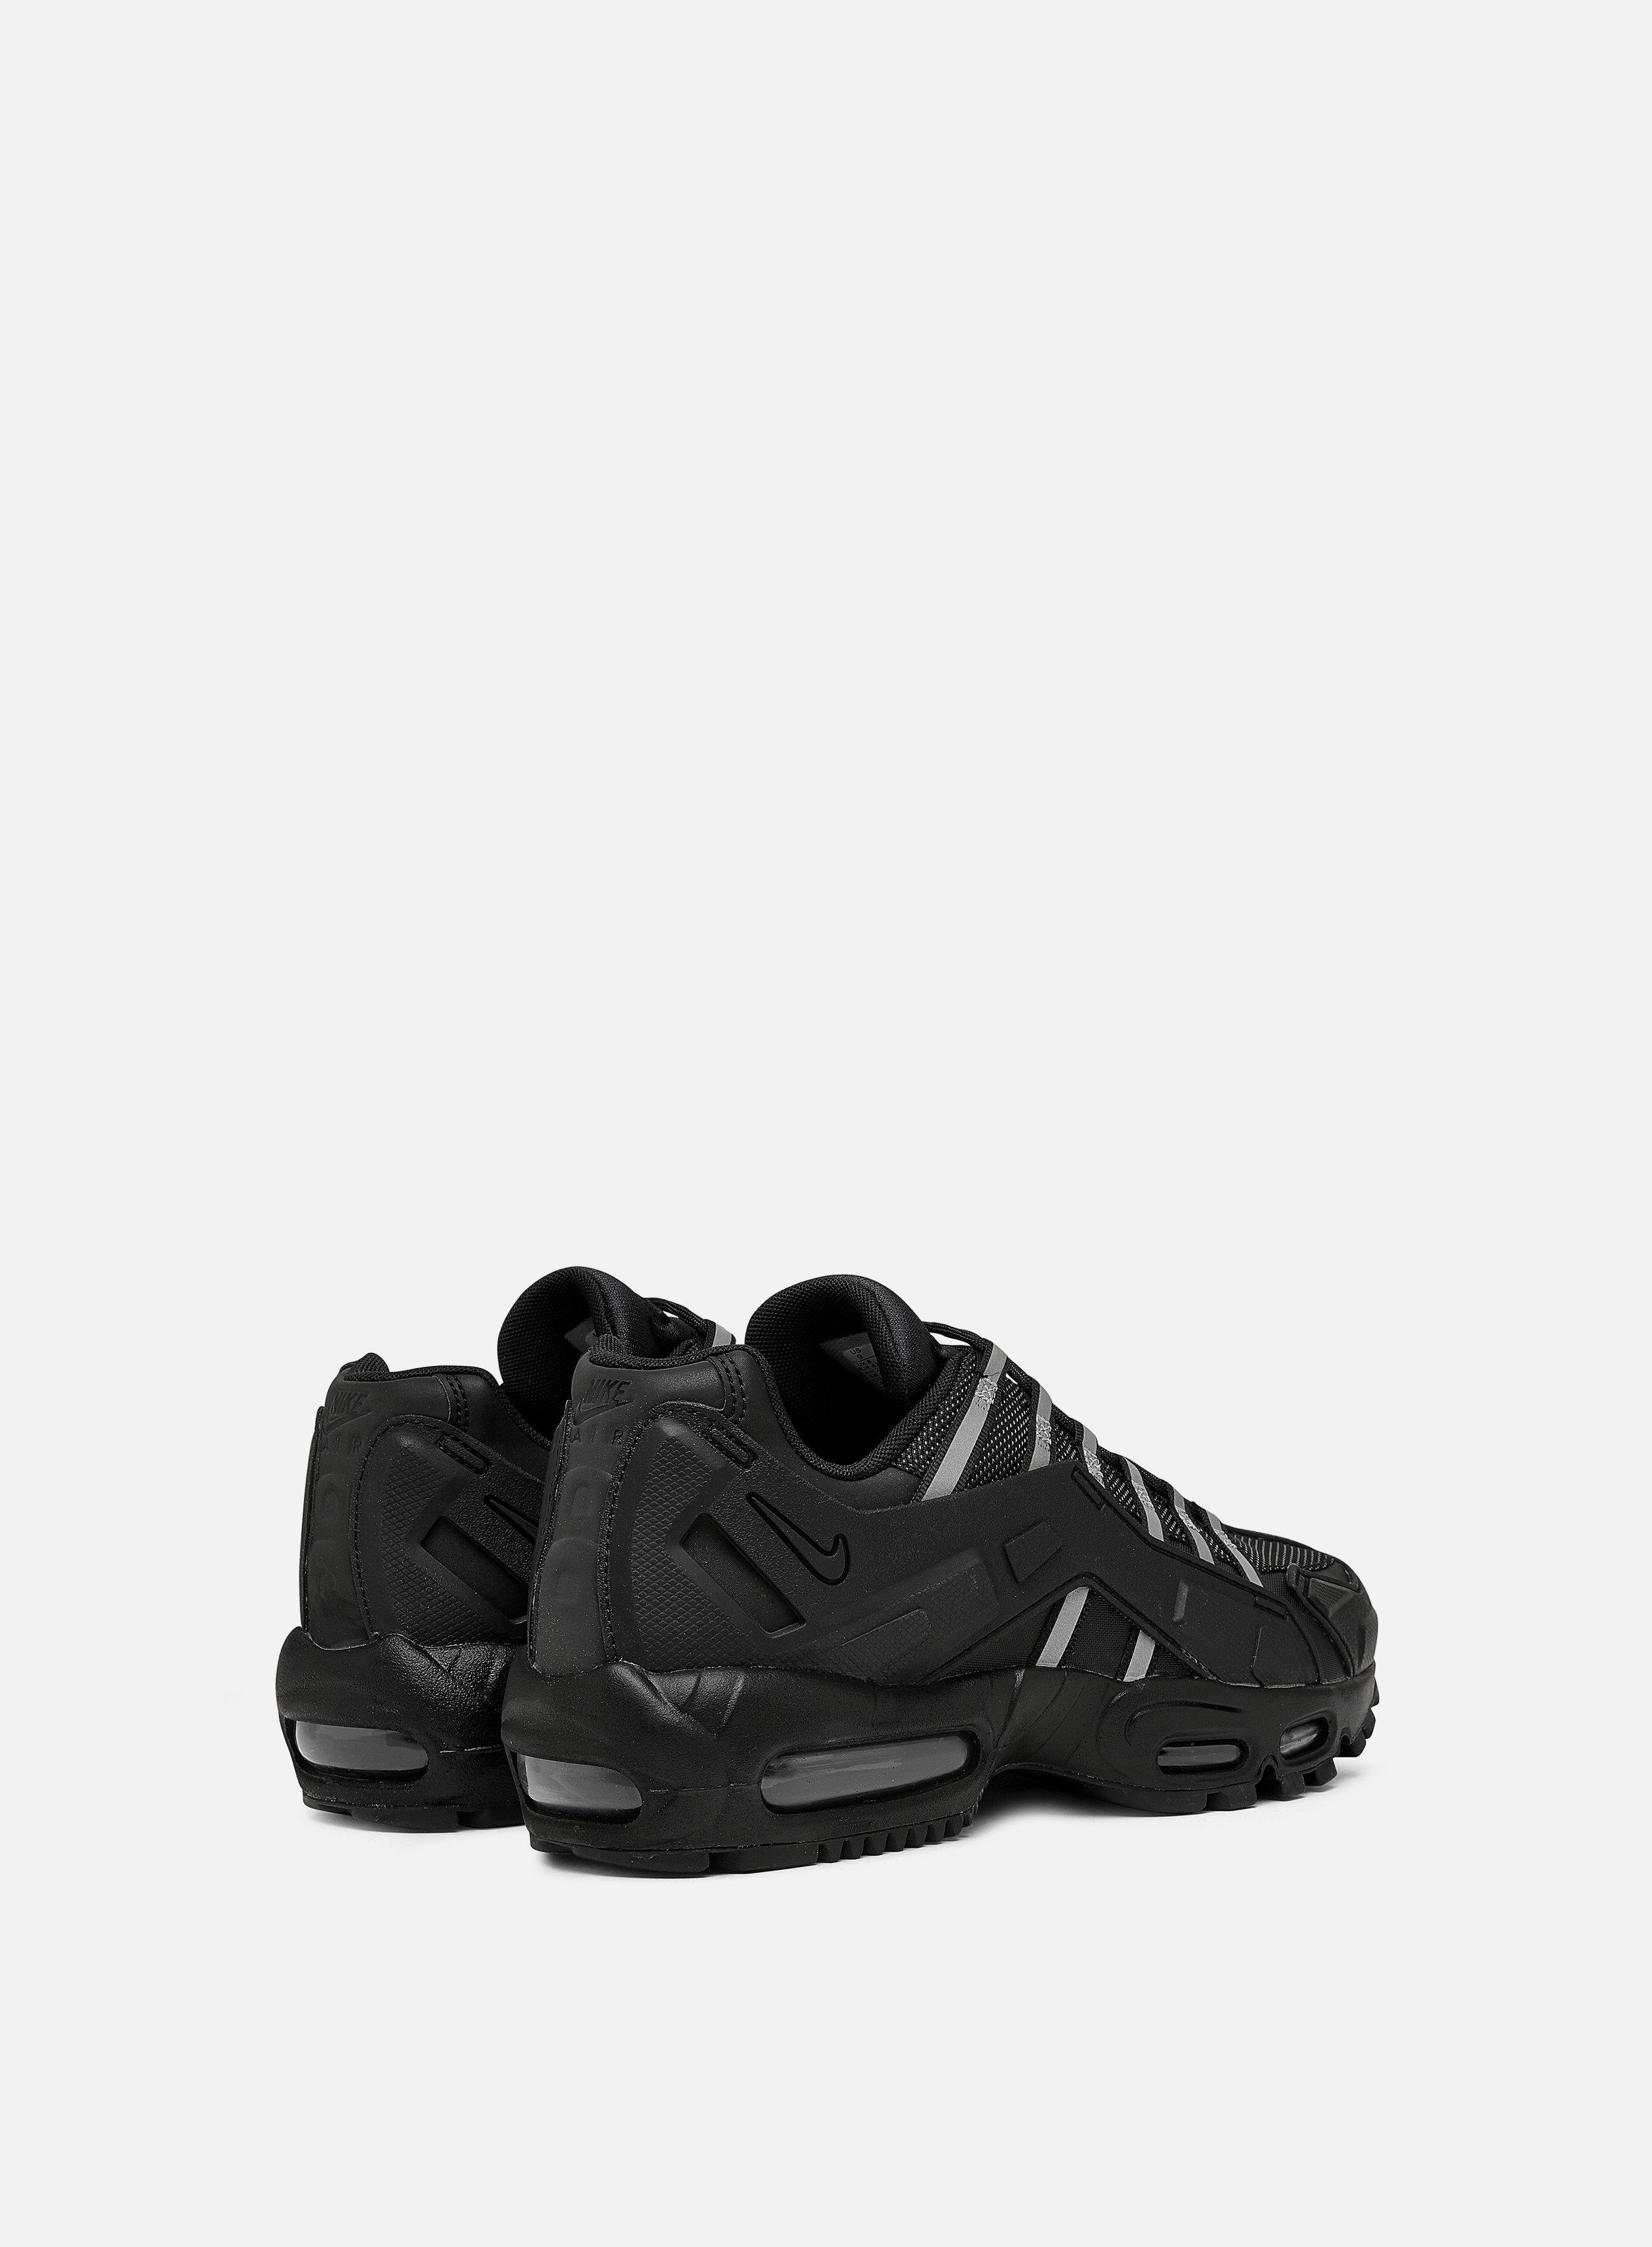 Nike Air Max 95 NDSTRKT, Black Black Black | Graffitishop